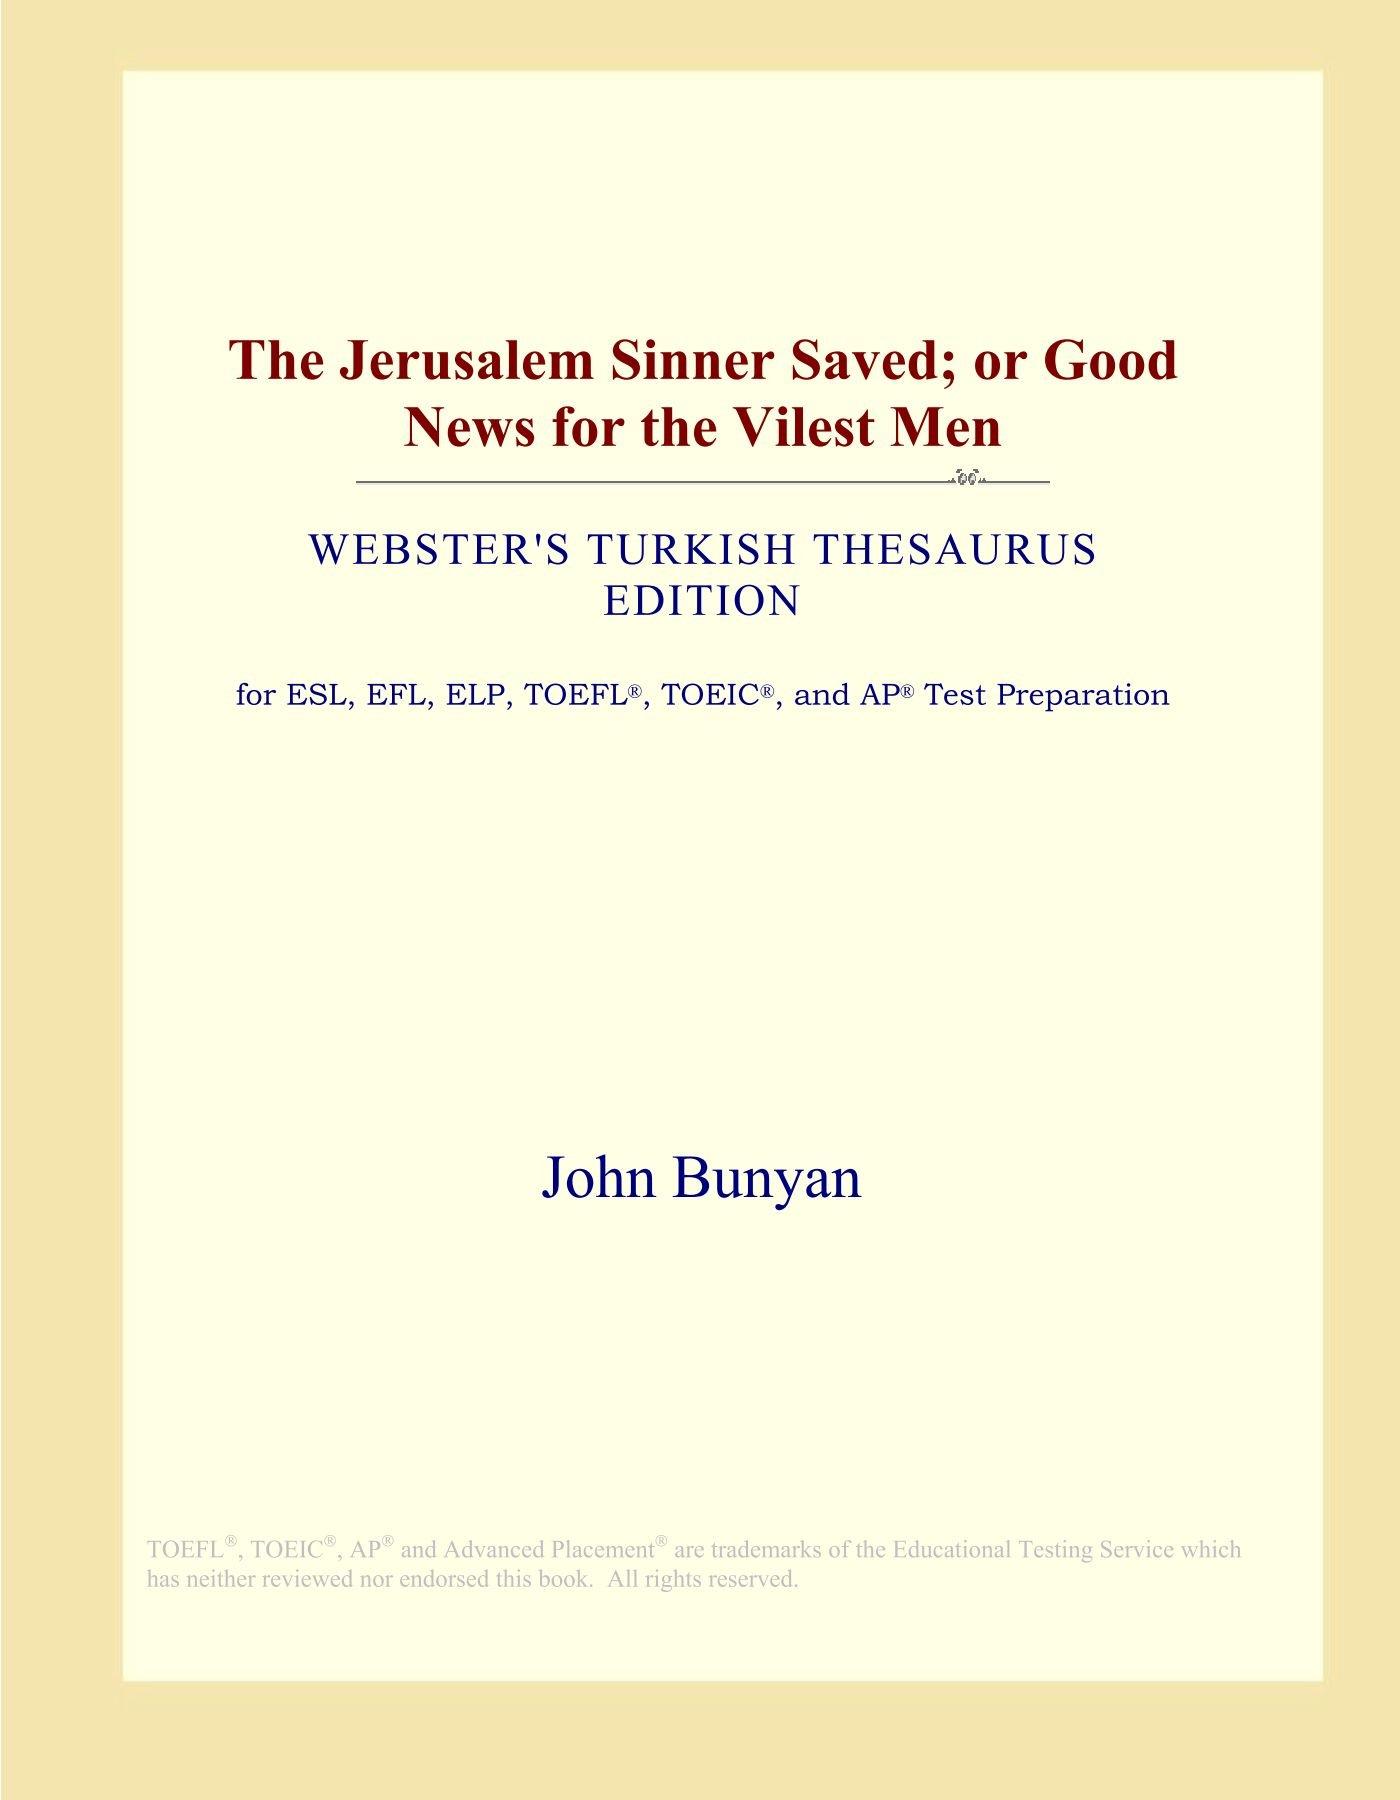 The Jerusalem Sinner Saved; or Good News for the Vilest Men (Webster's Turkish Thesaurus Edition) pdf epub